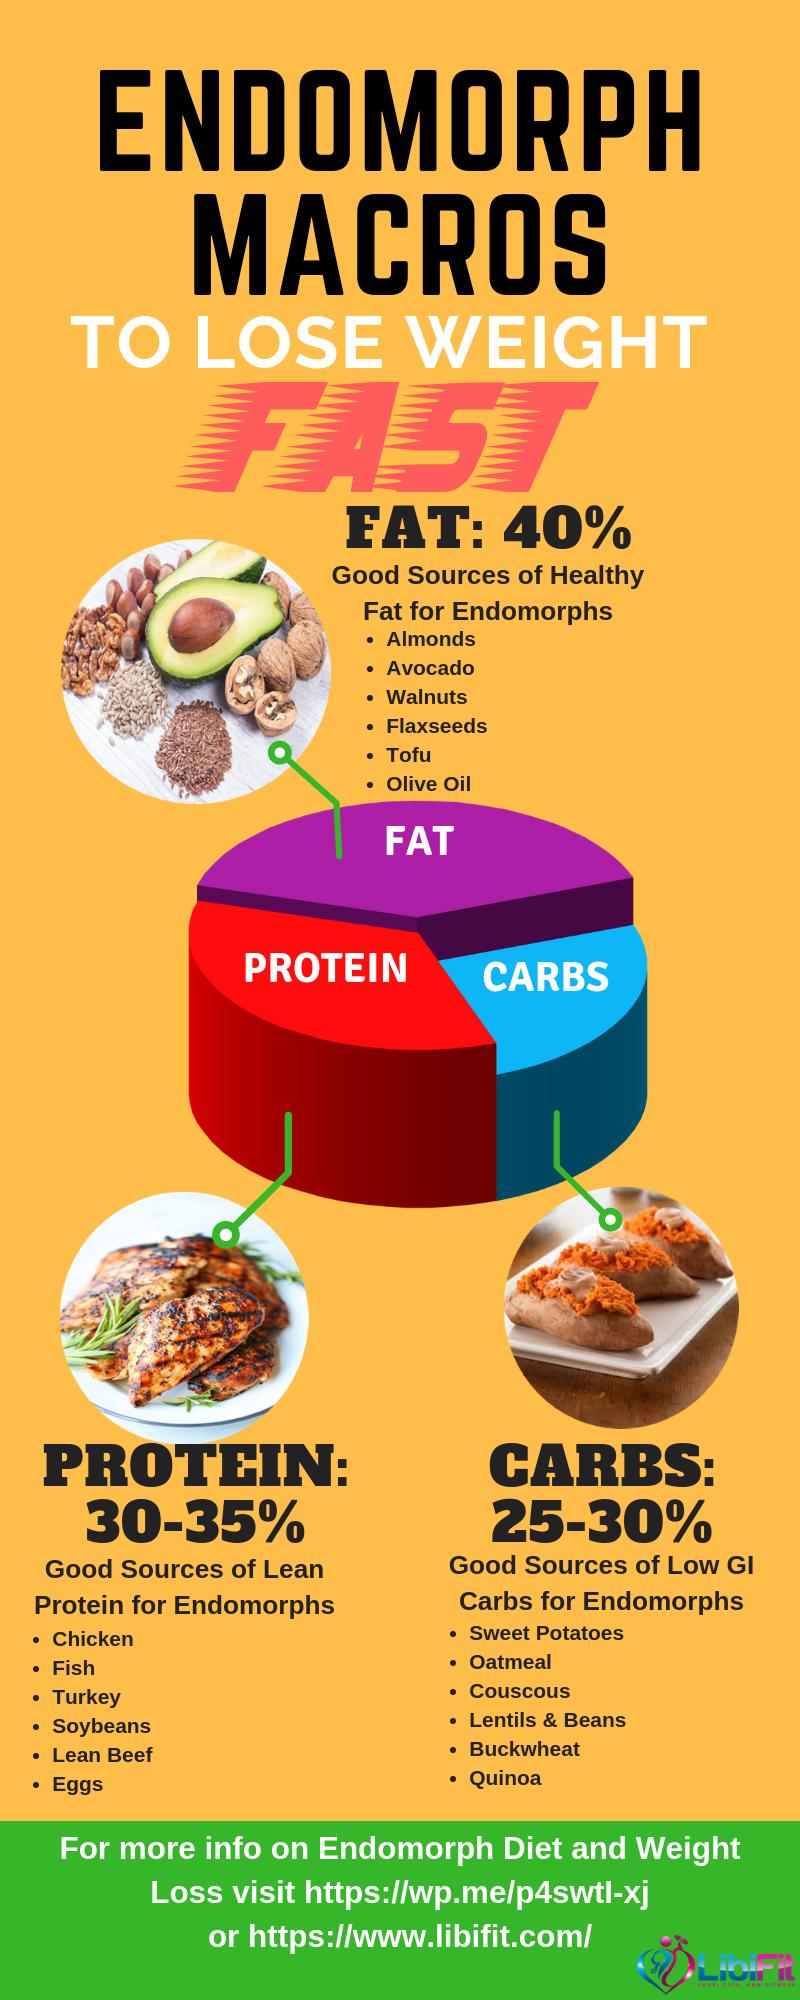 keto diet and endomorph